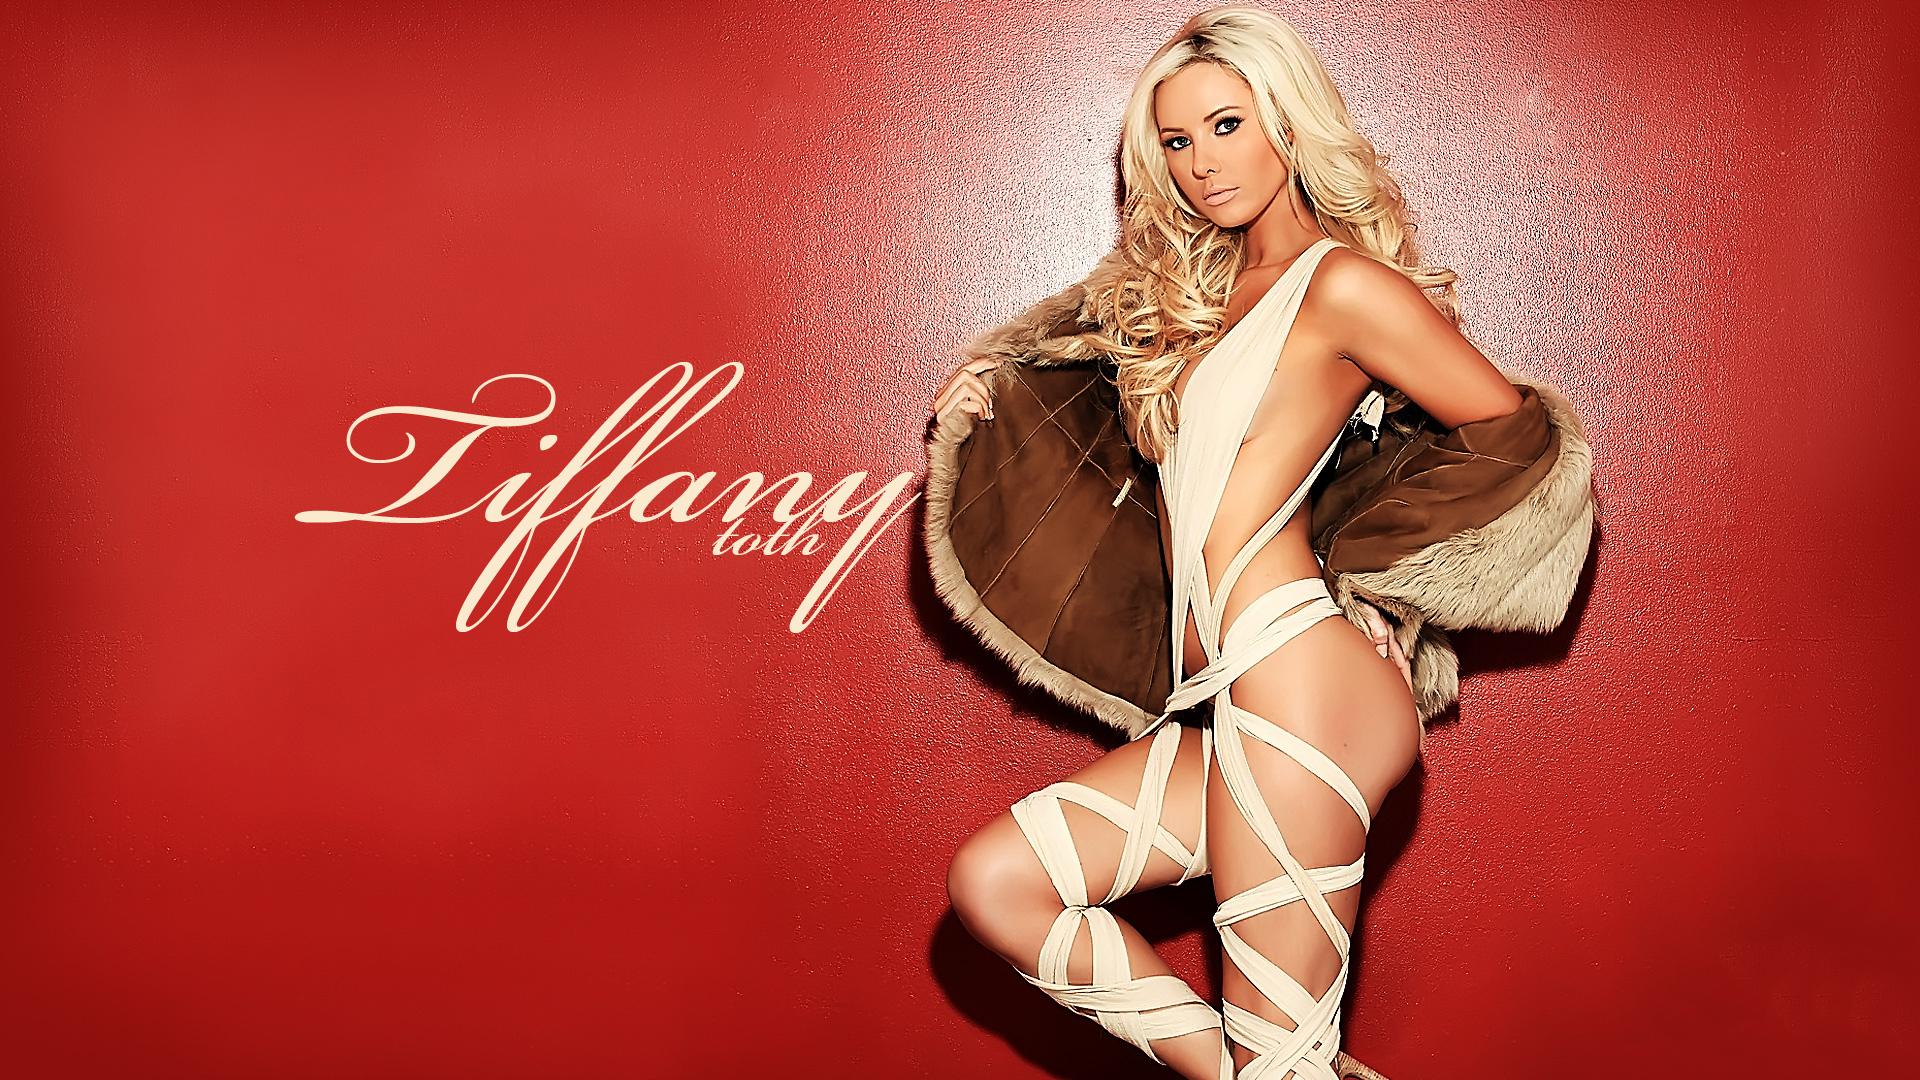 Tiffany Toth Hot